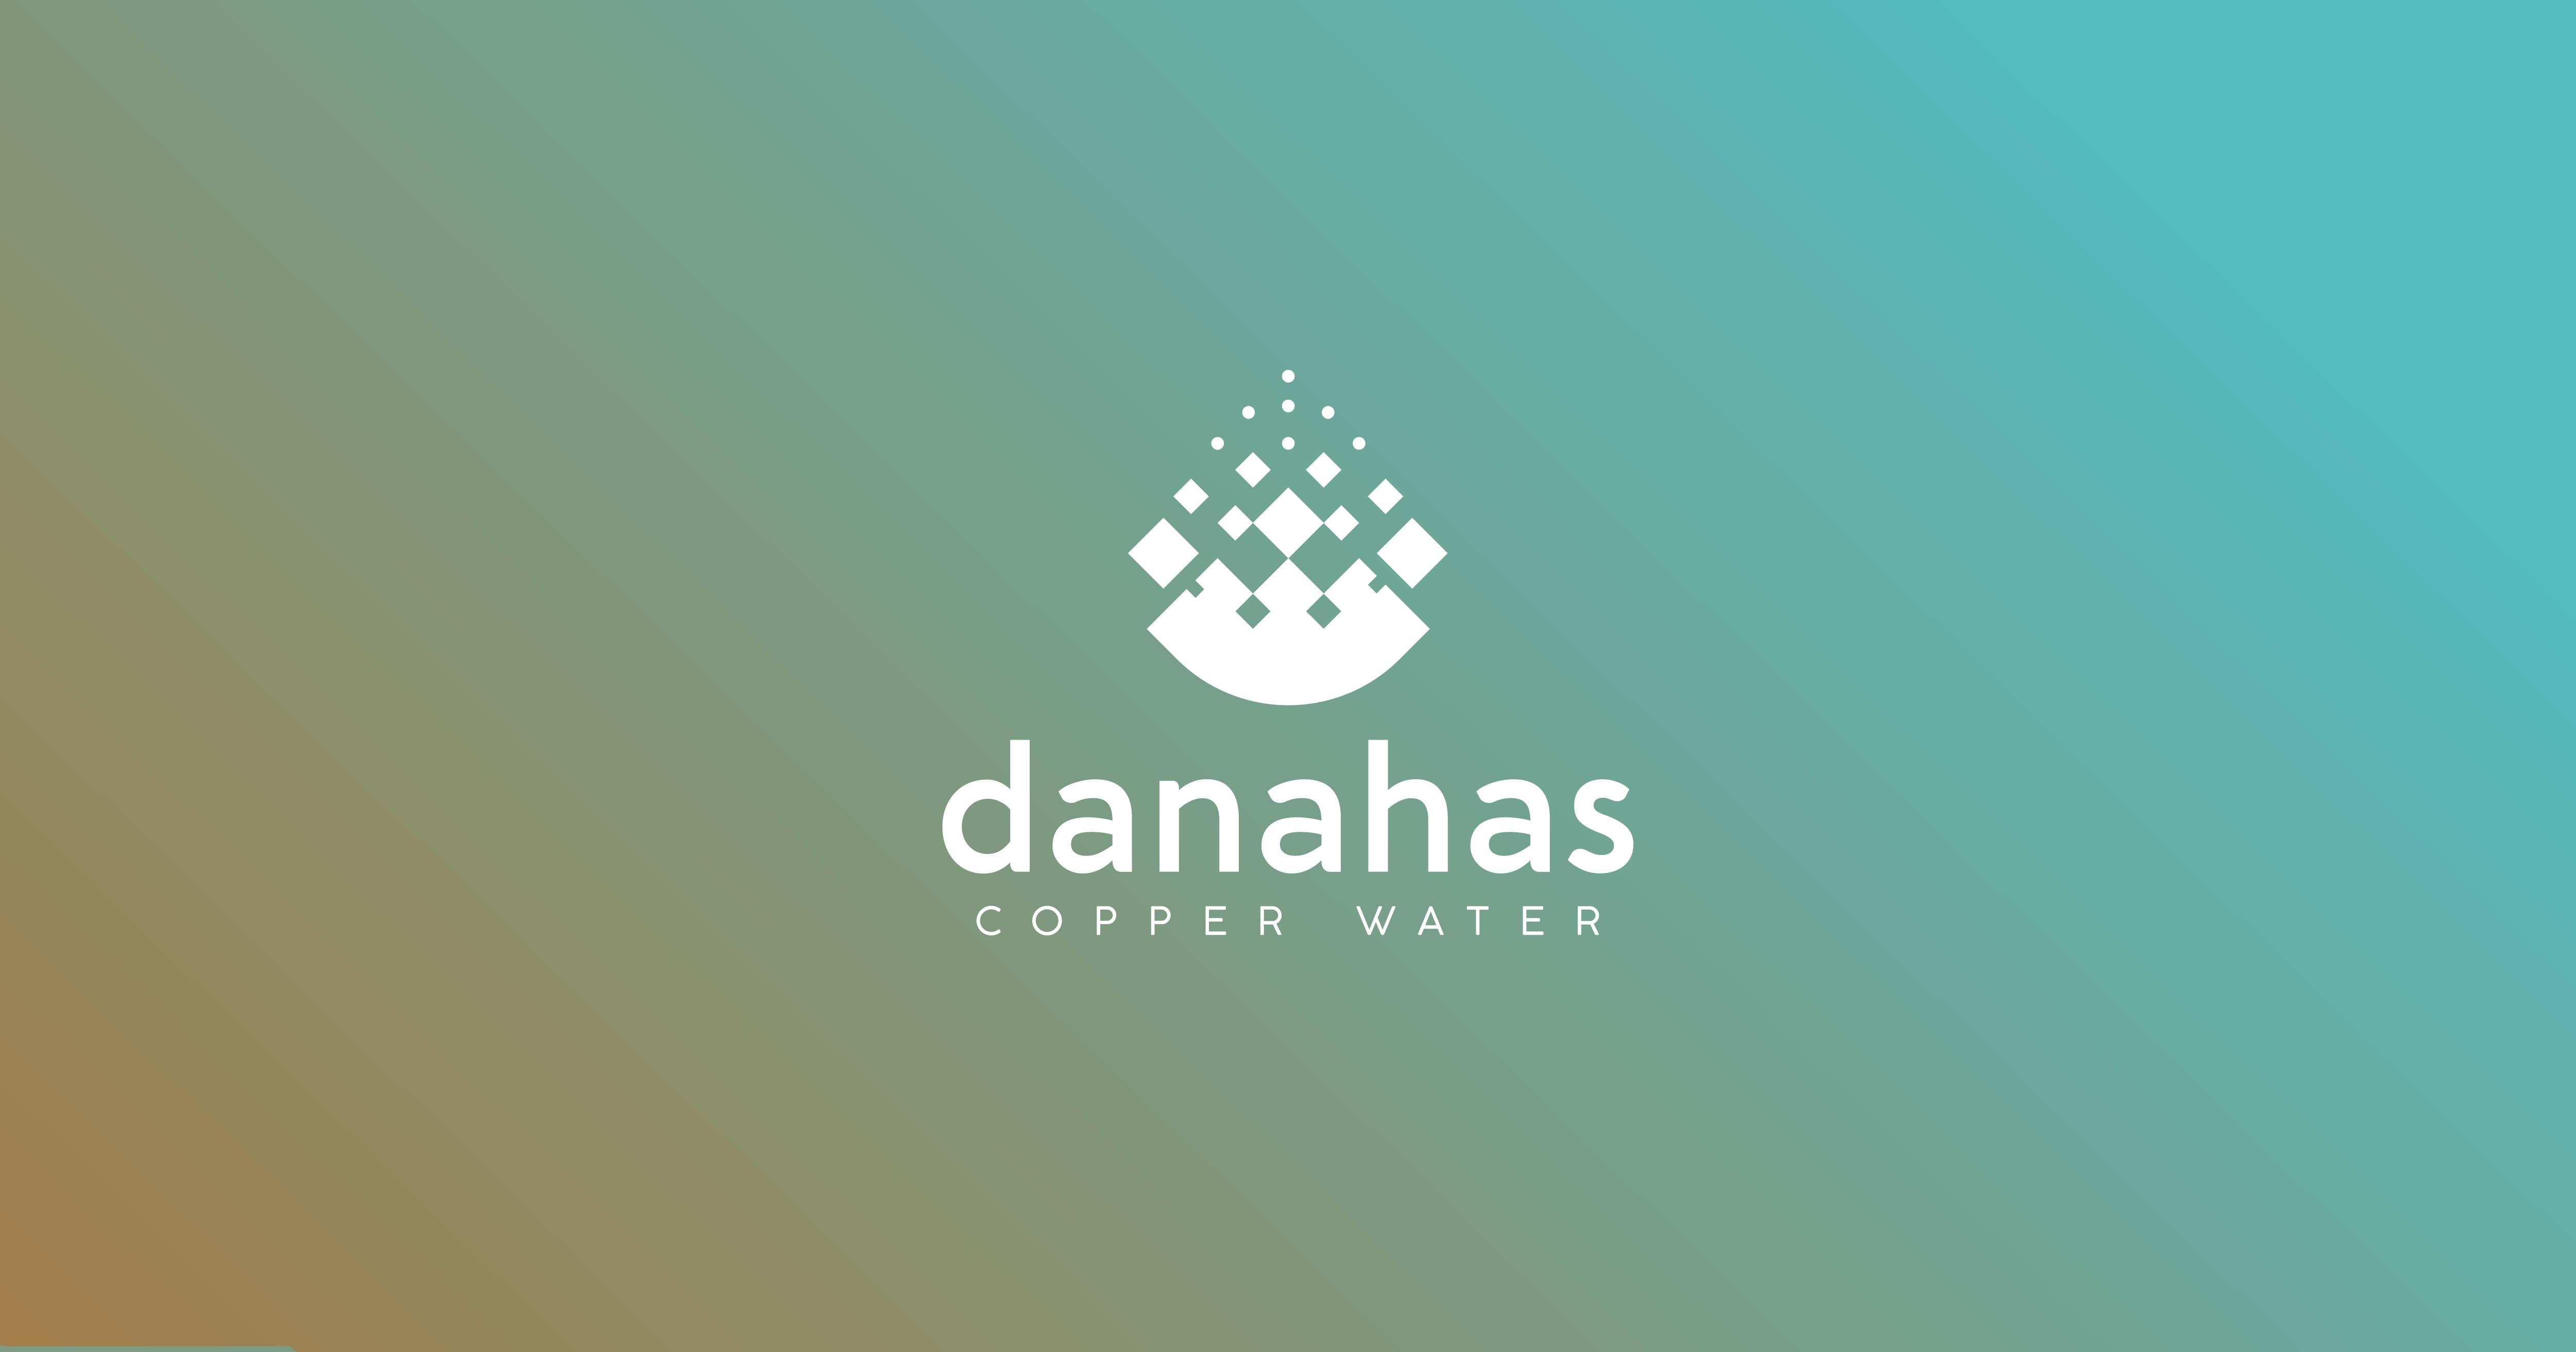 FullFrame-Photomkt-Danahas-Portafolio (1)